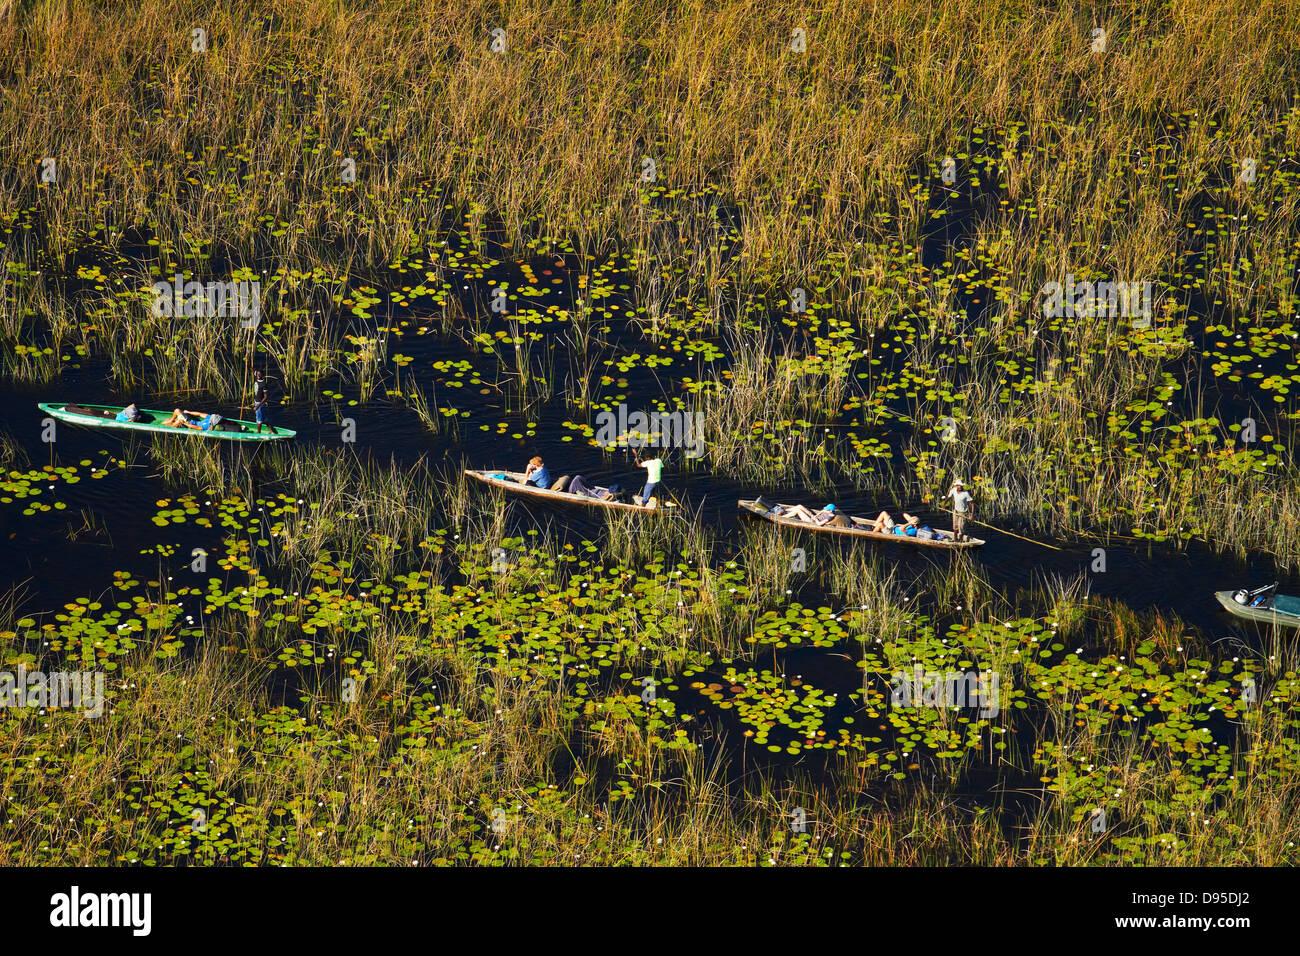 Tourists in mekoro (dugout canoes), Okavango Delta, Botswana, Africa- aerial - Stock Image